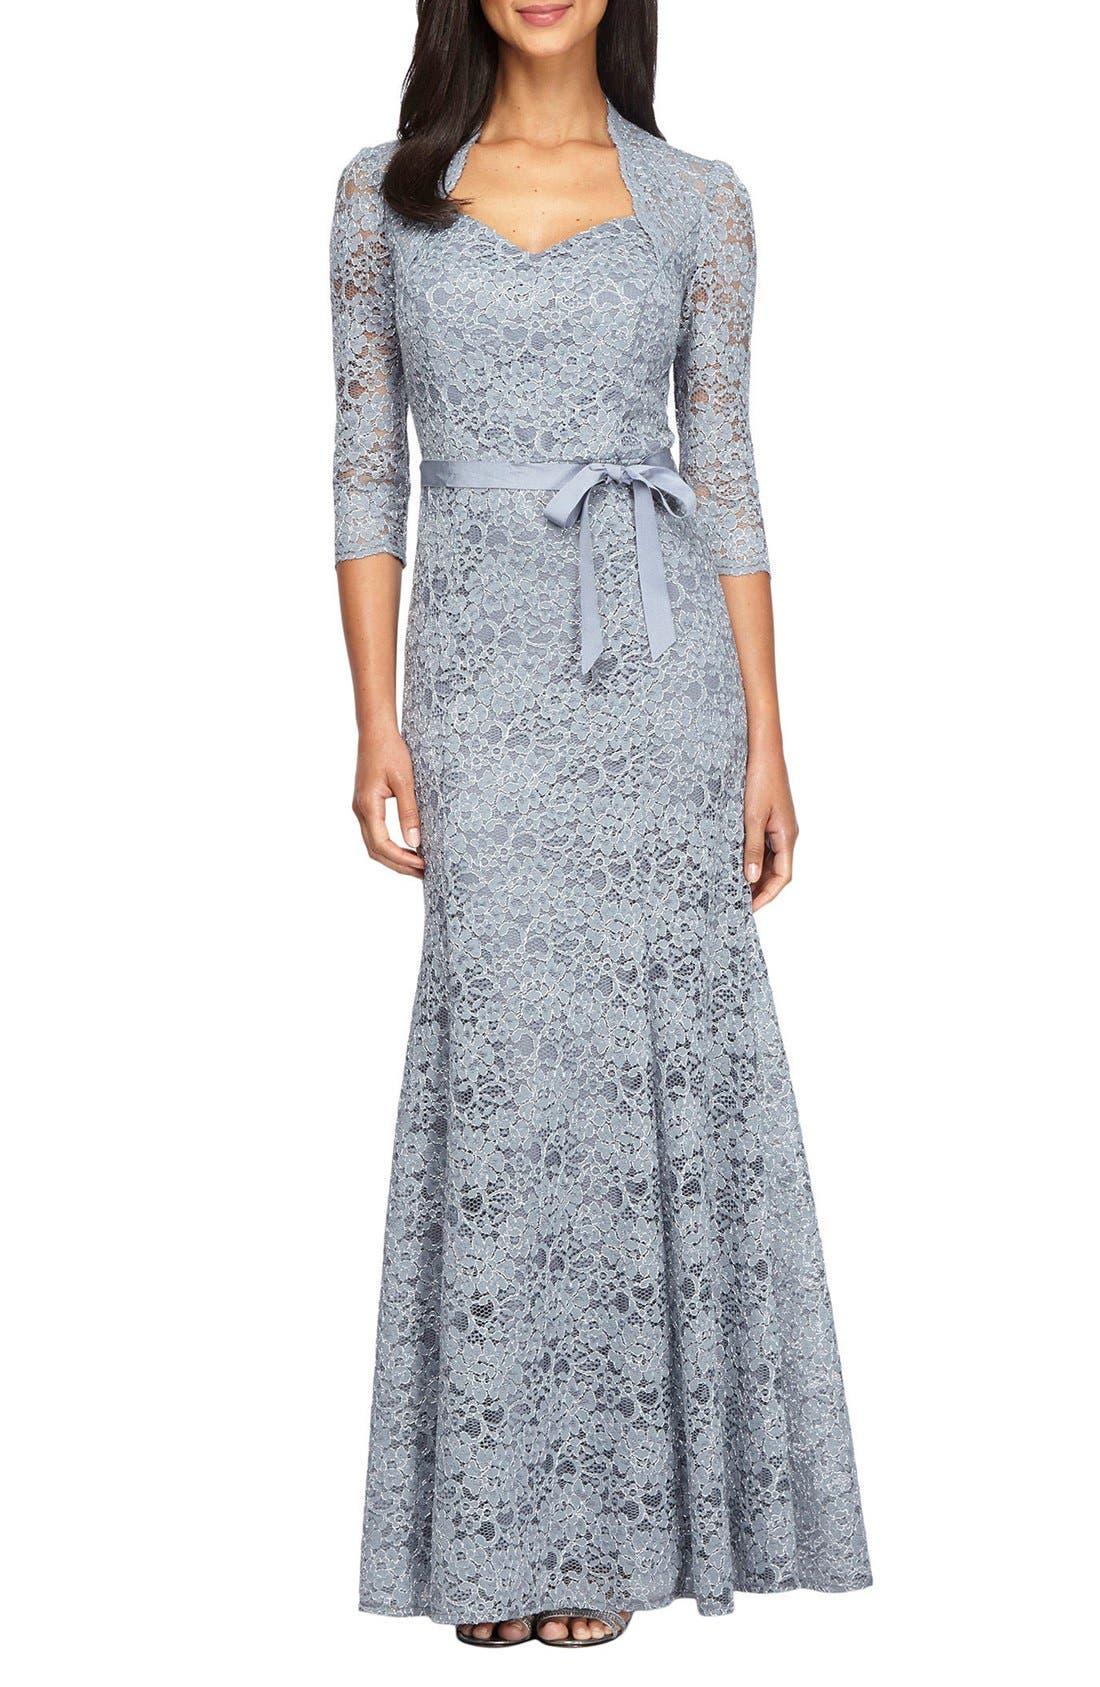 Main Image - Alex Evenings Metallic Lace Fit & Flare Gown (Regular & Petite)